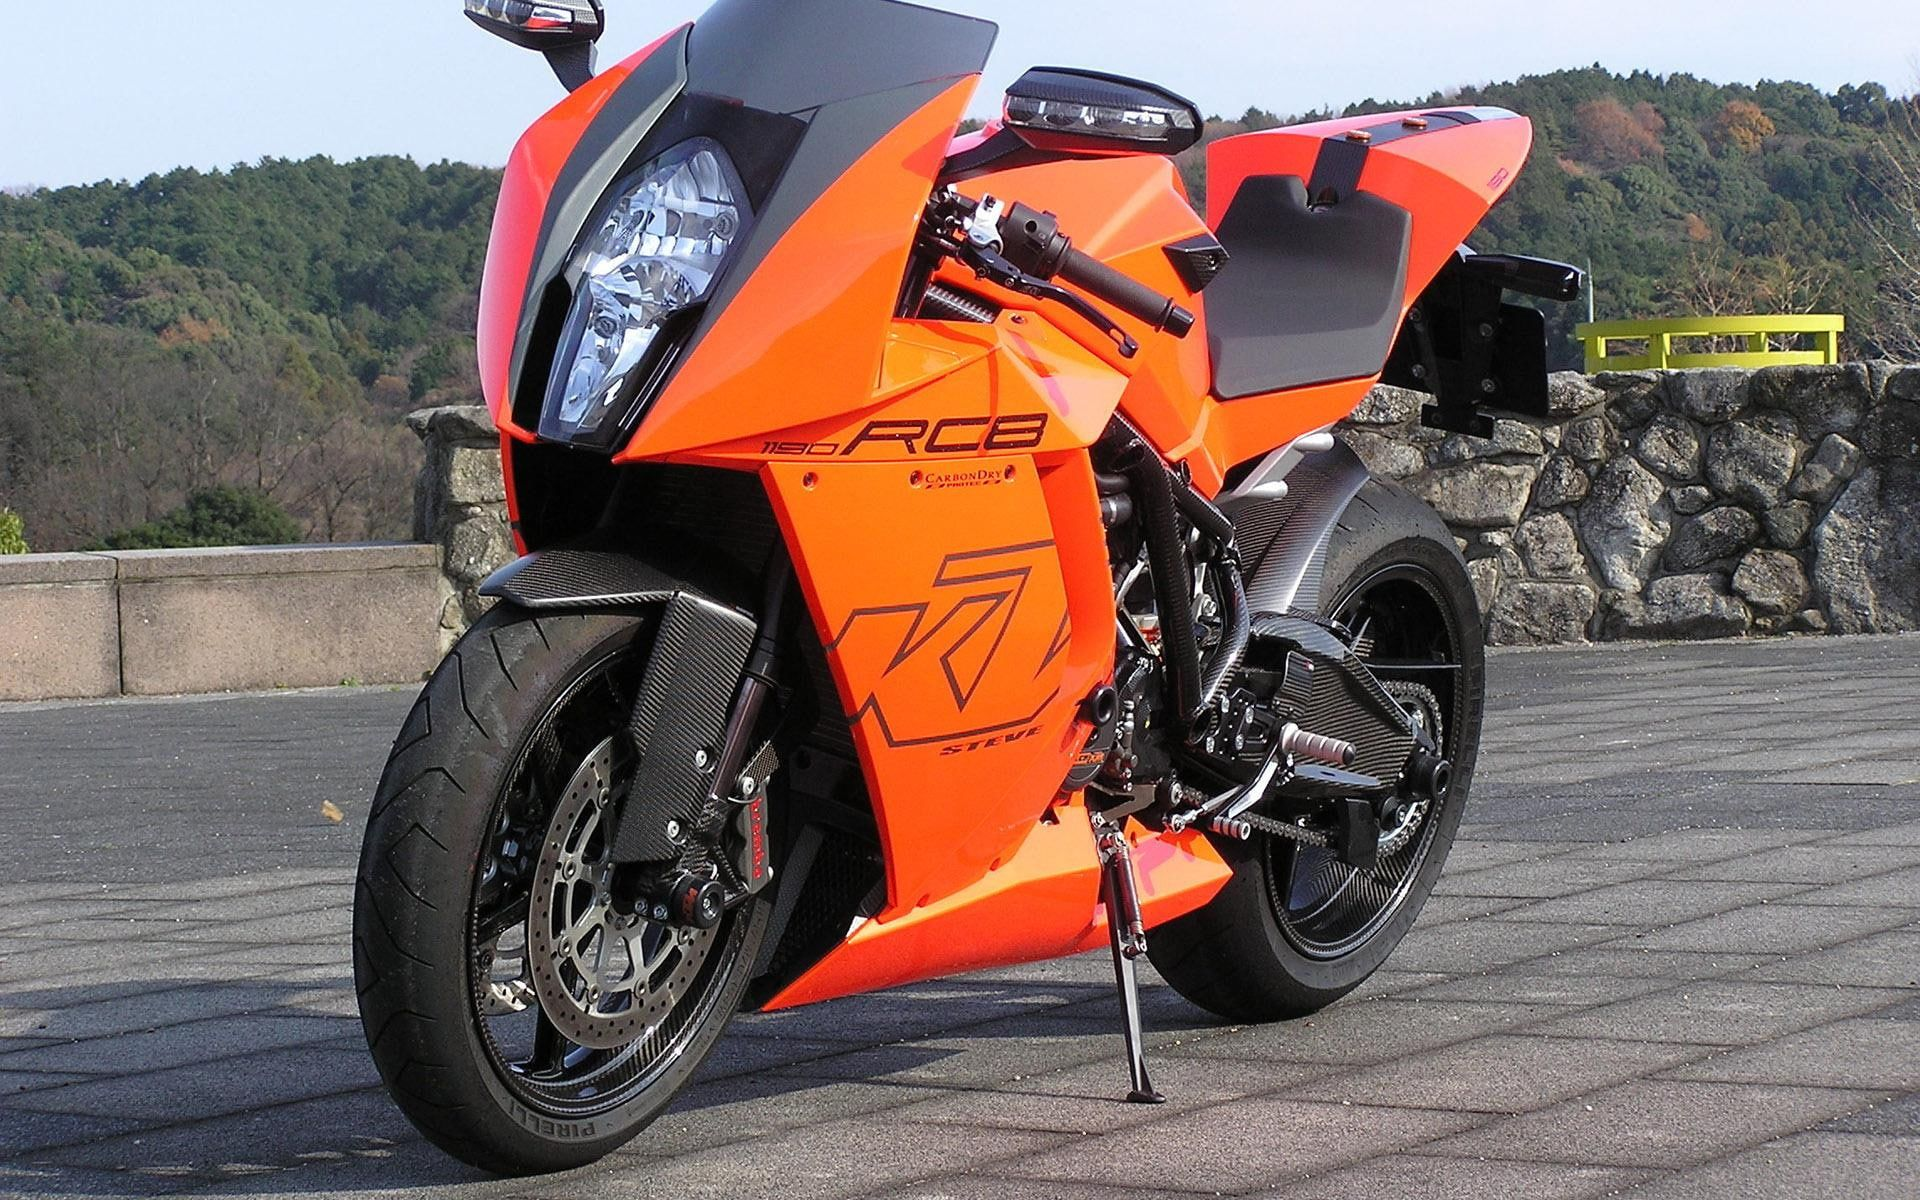 KTM 1190 RC8, orange and black ktm rcb motorcycles